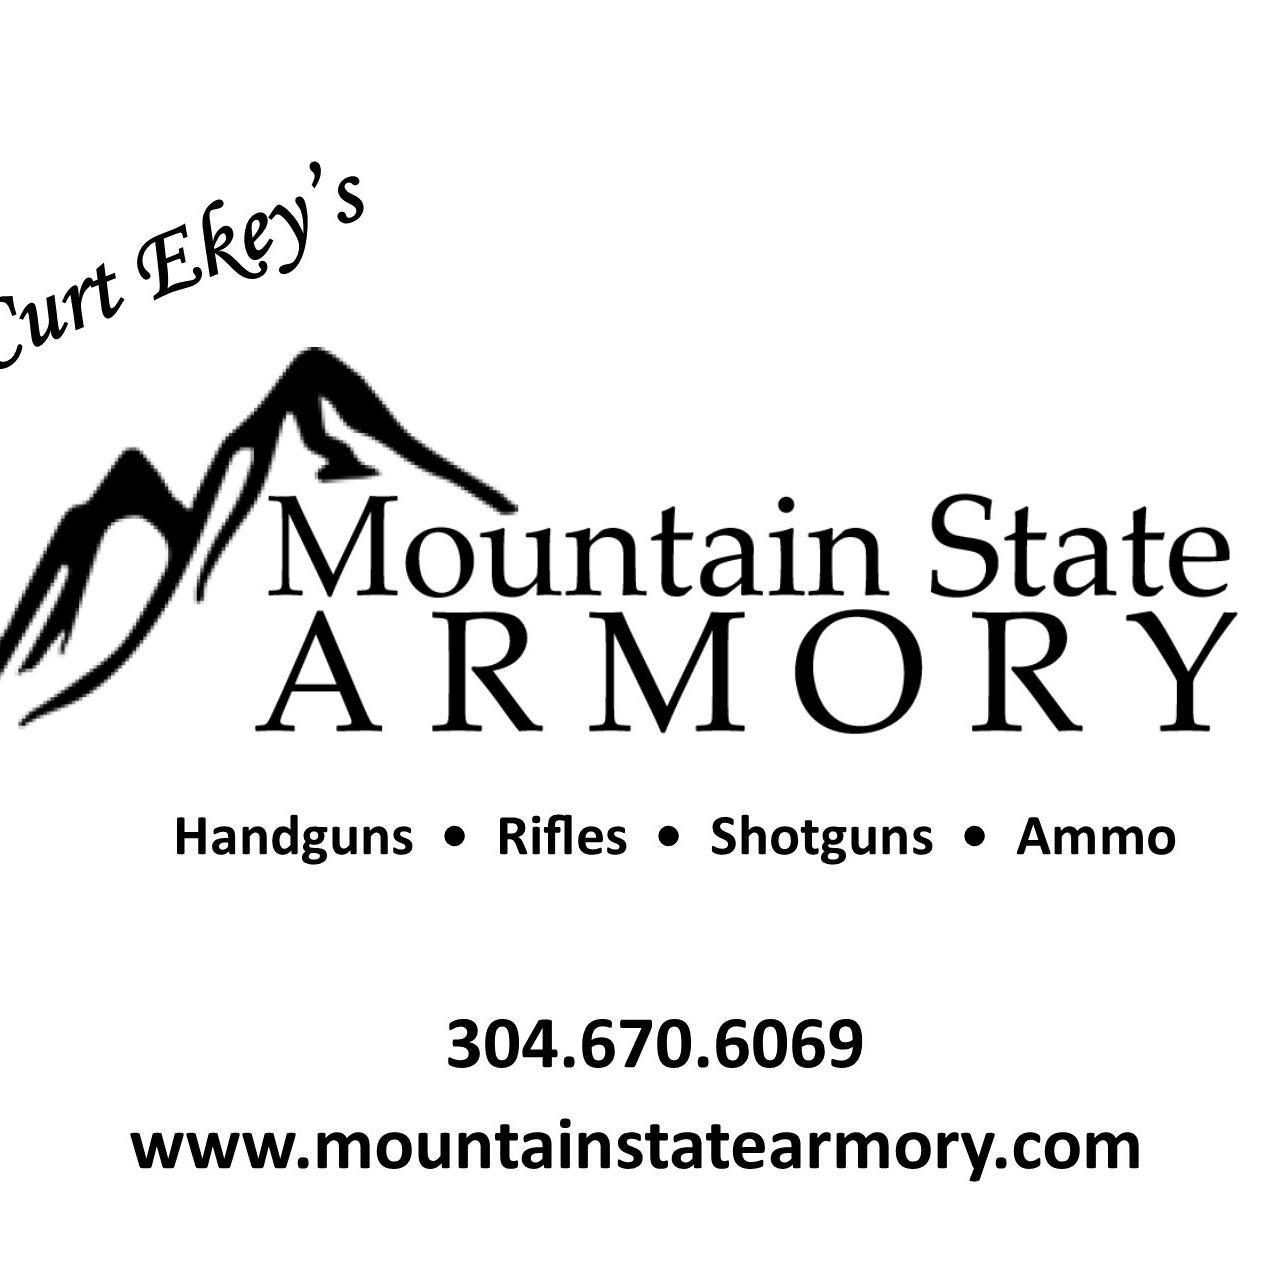 Mountain State Armory